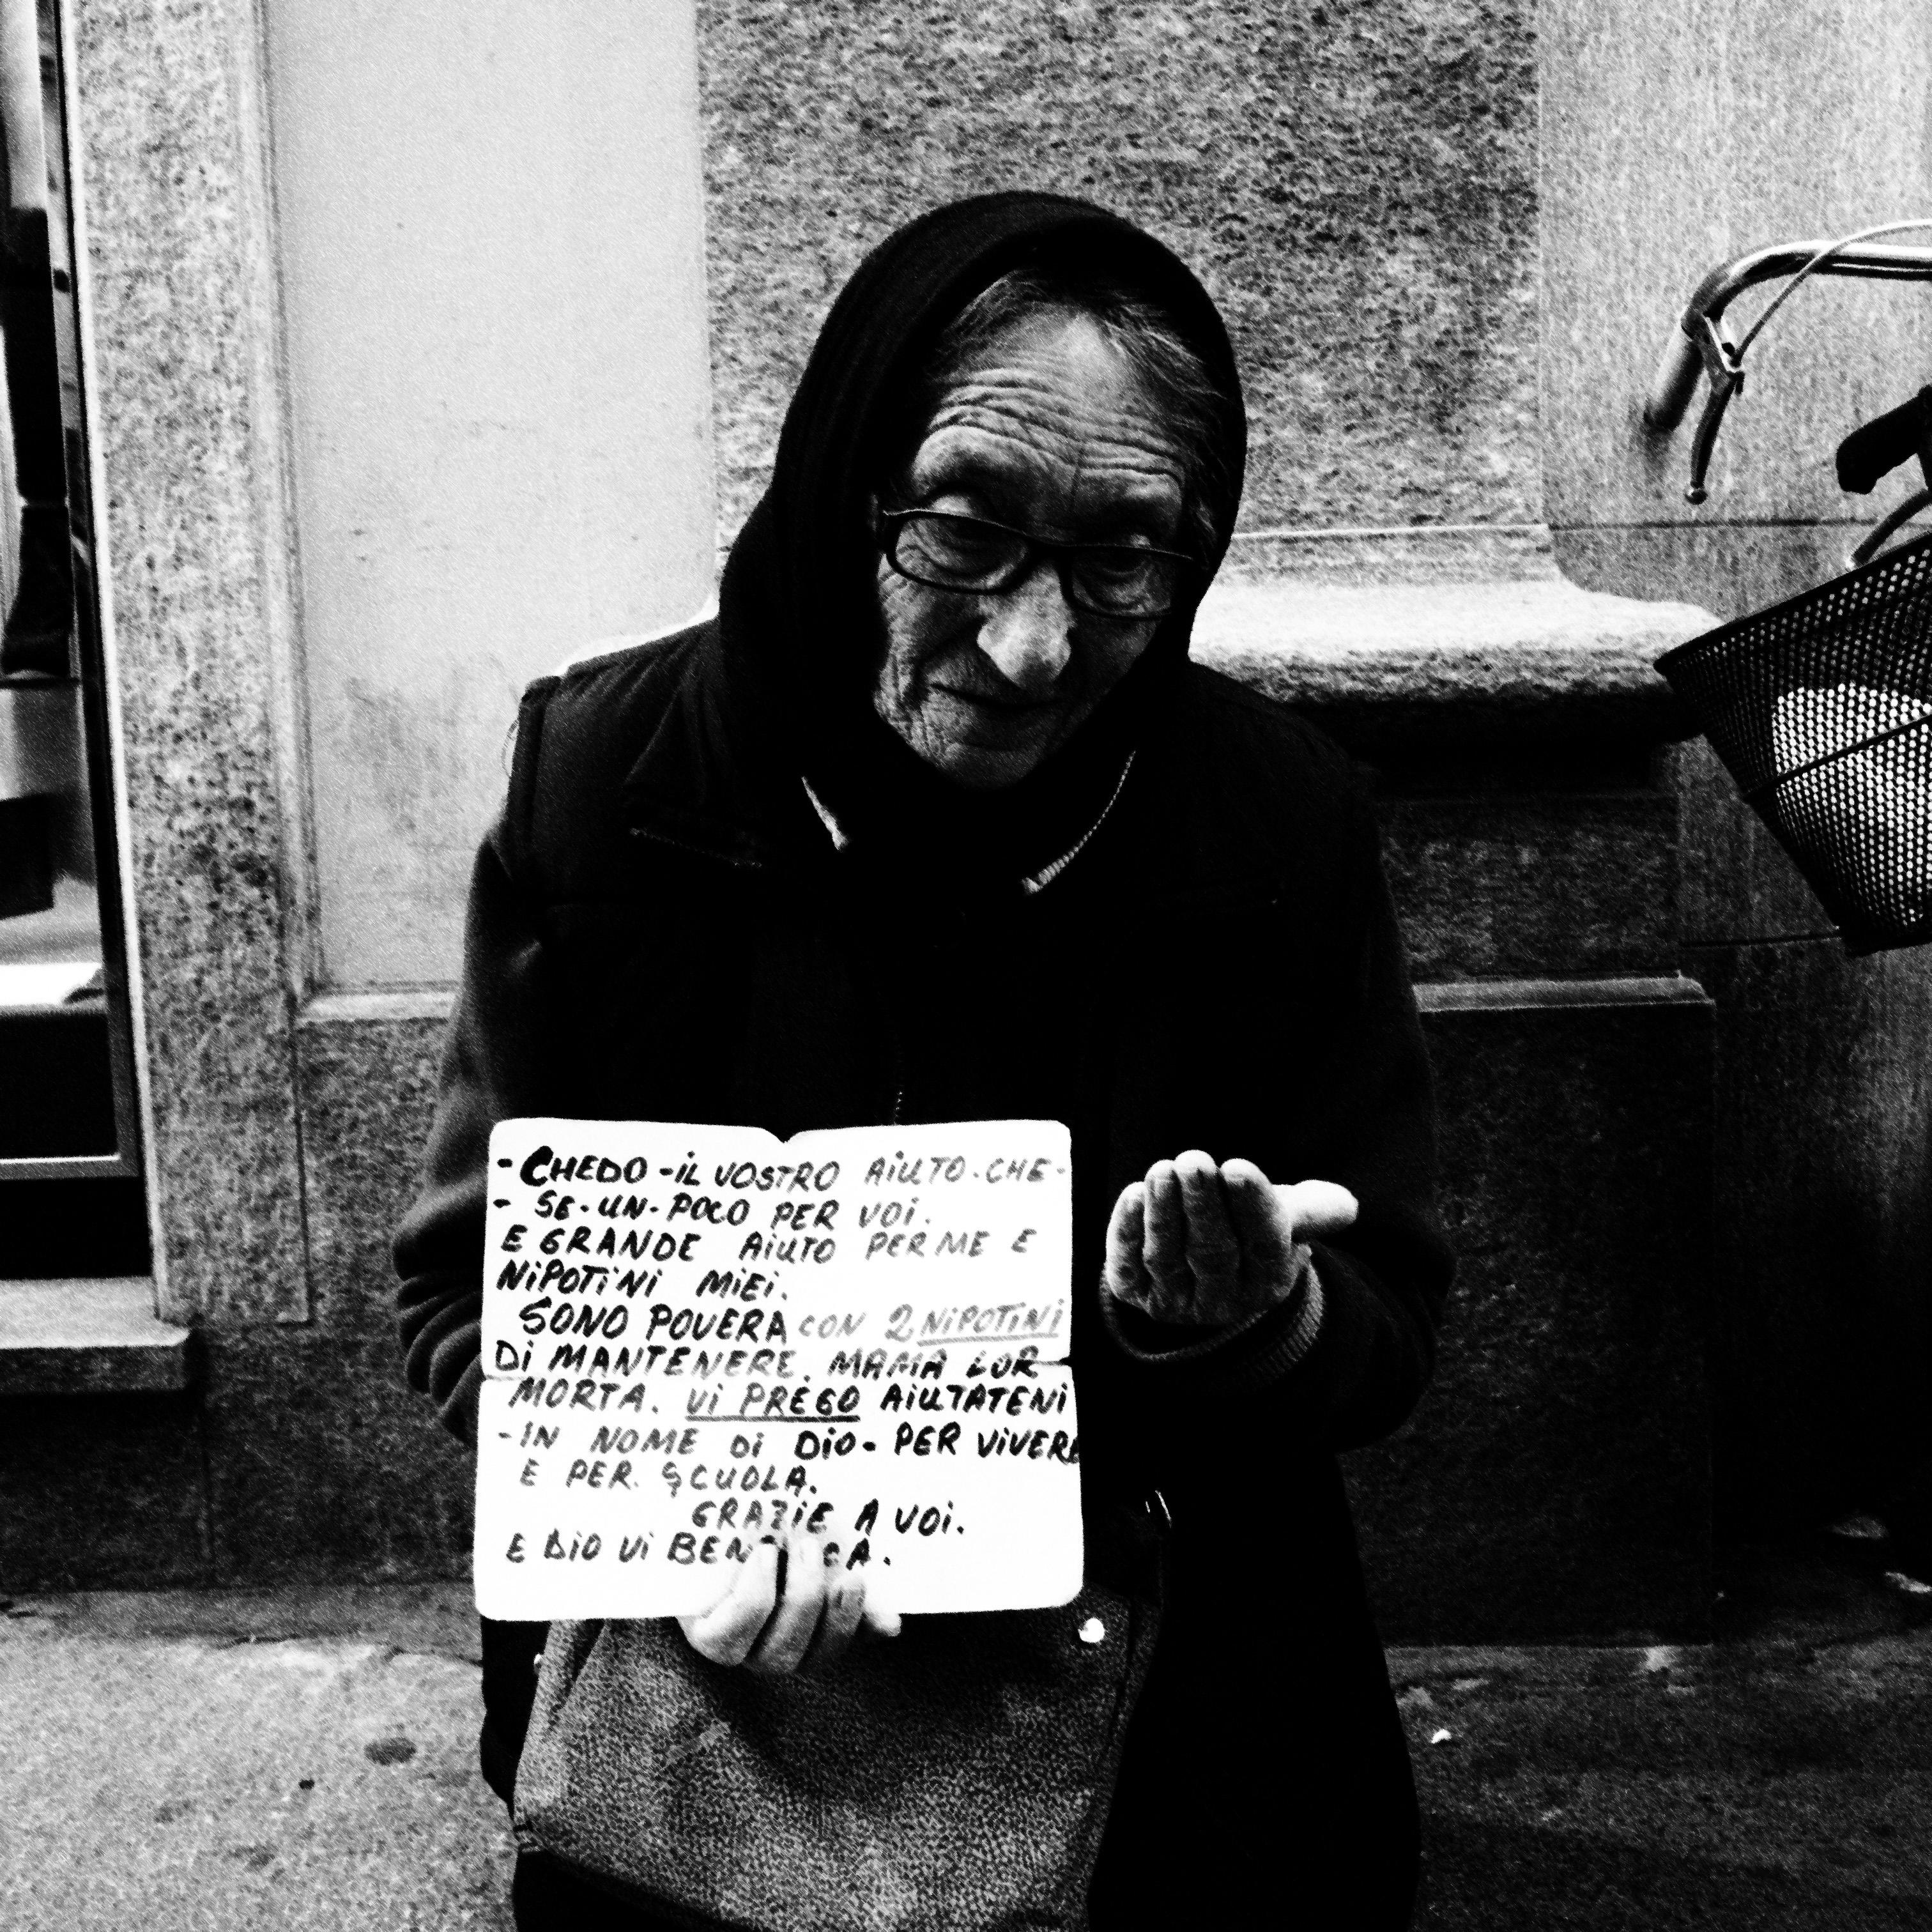 Begging Woman